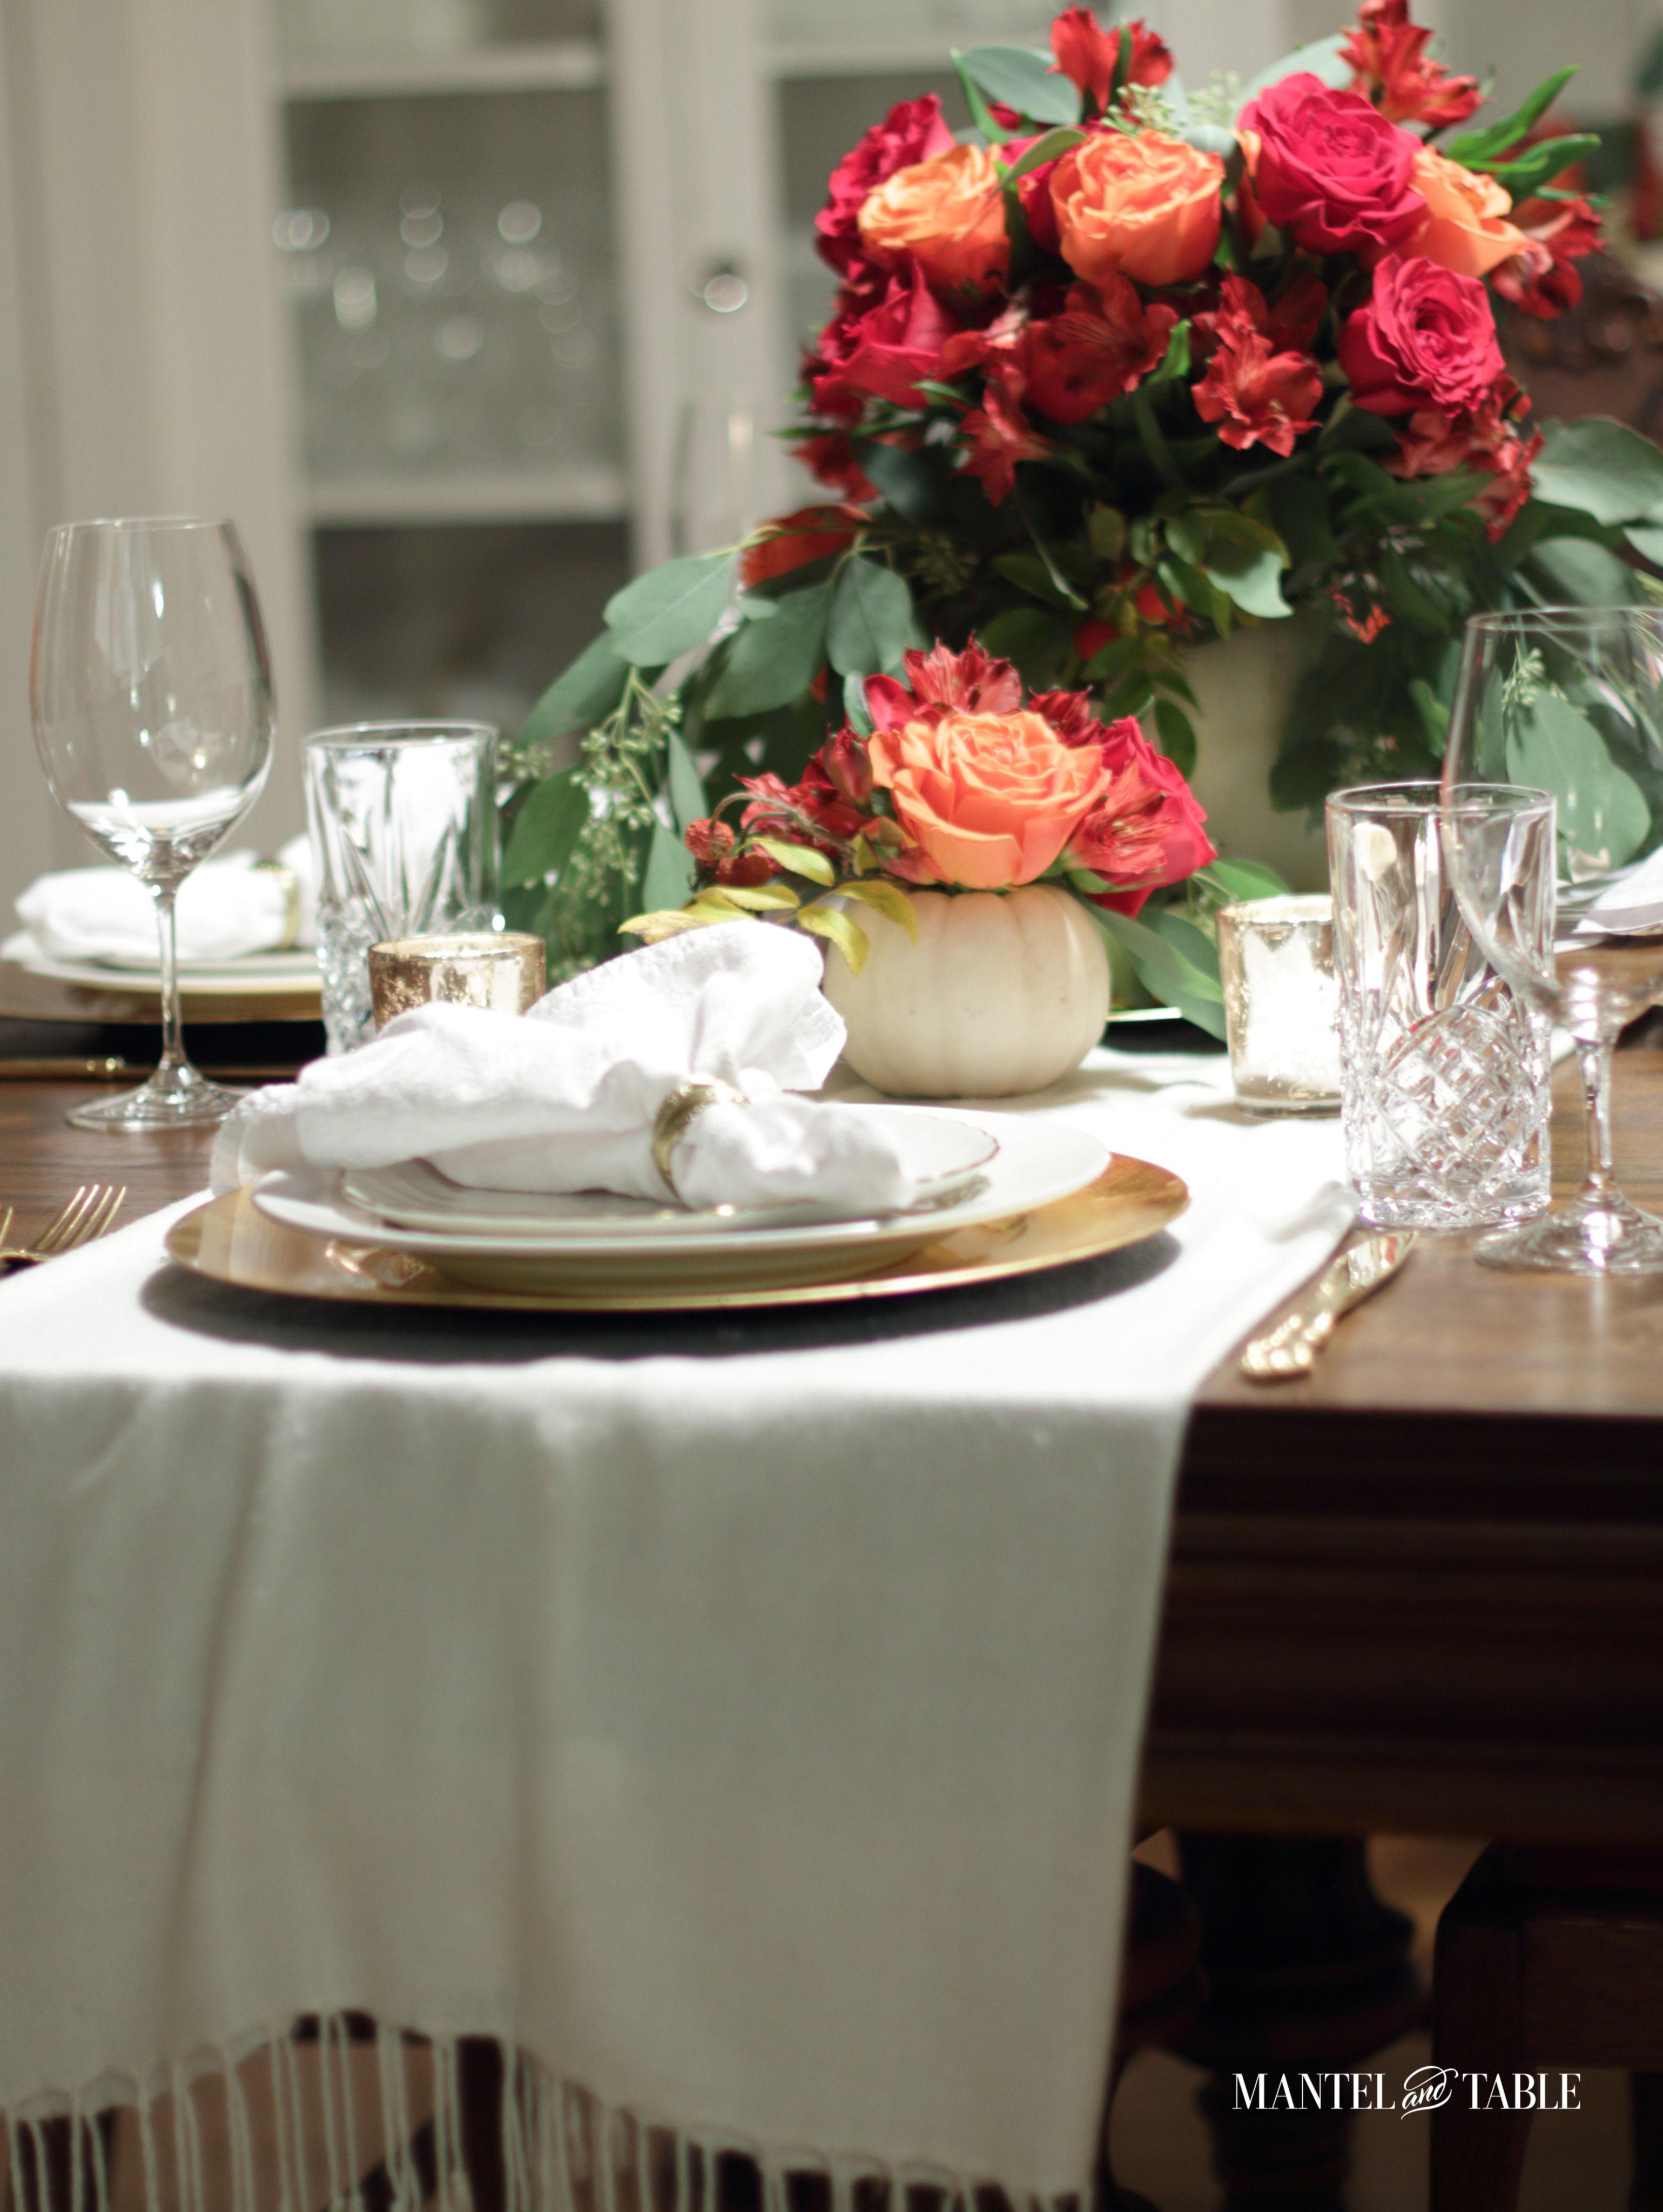 White pumpkin flower arrangement centerpieces on the table